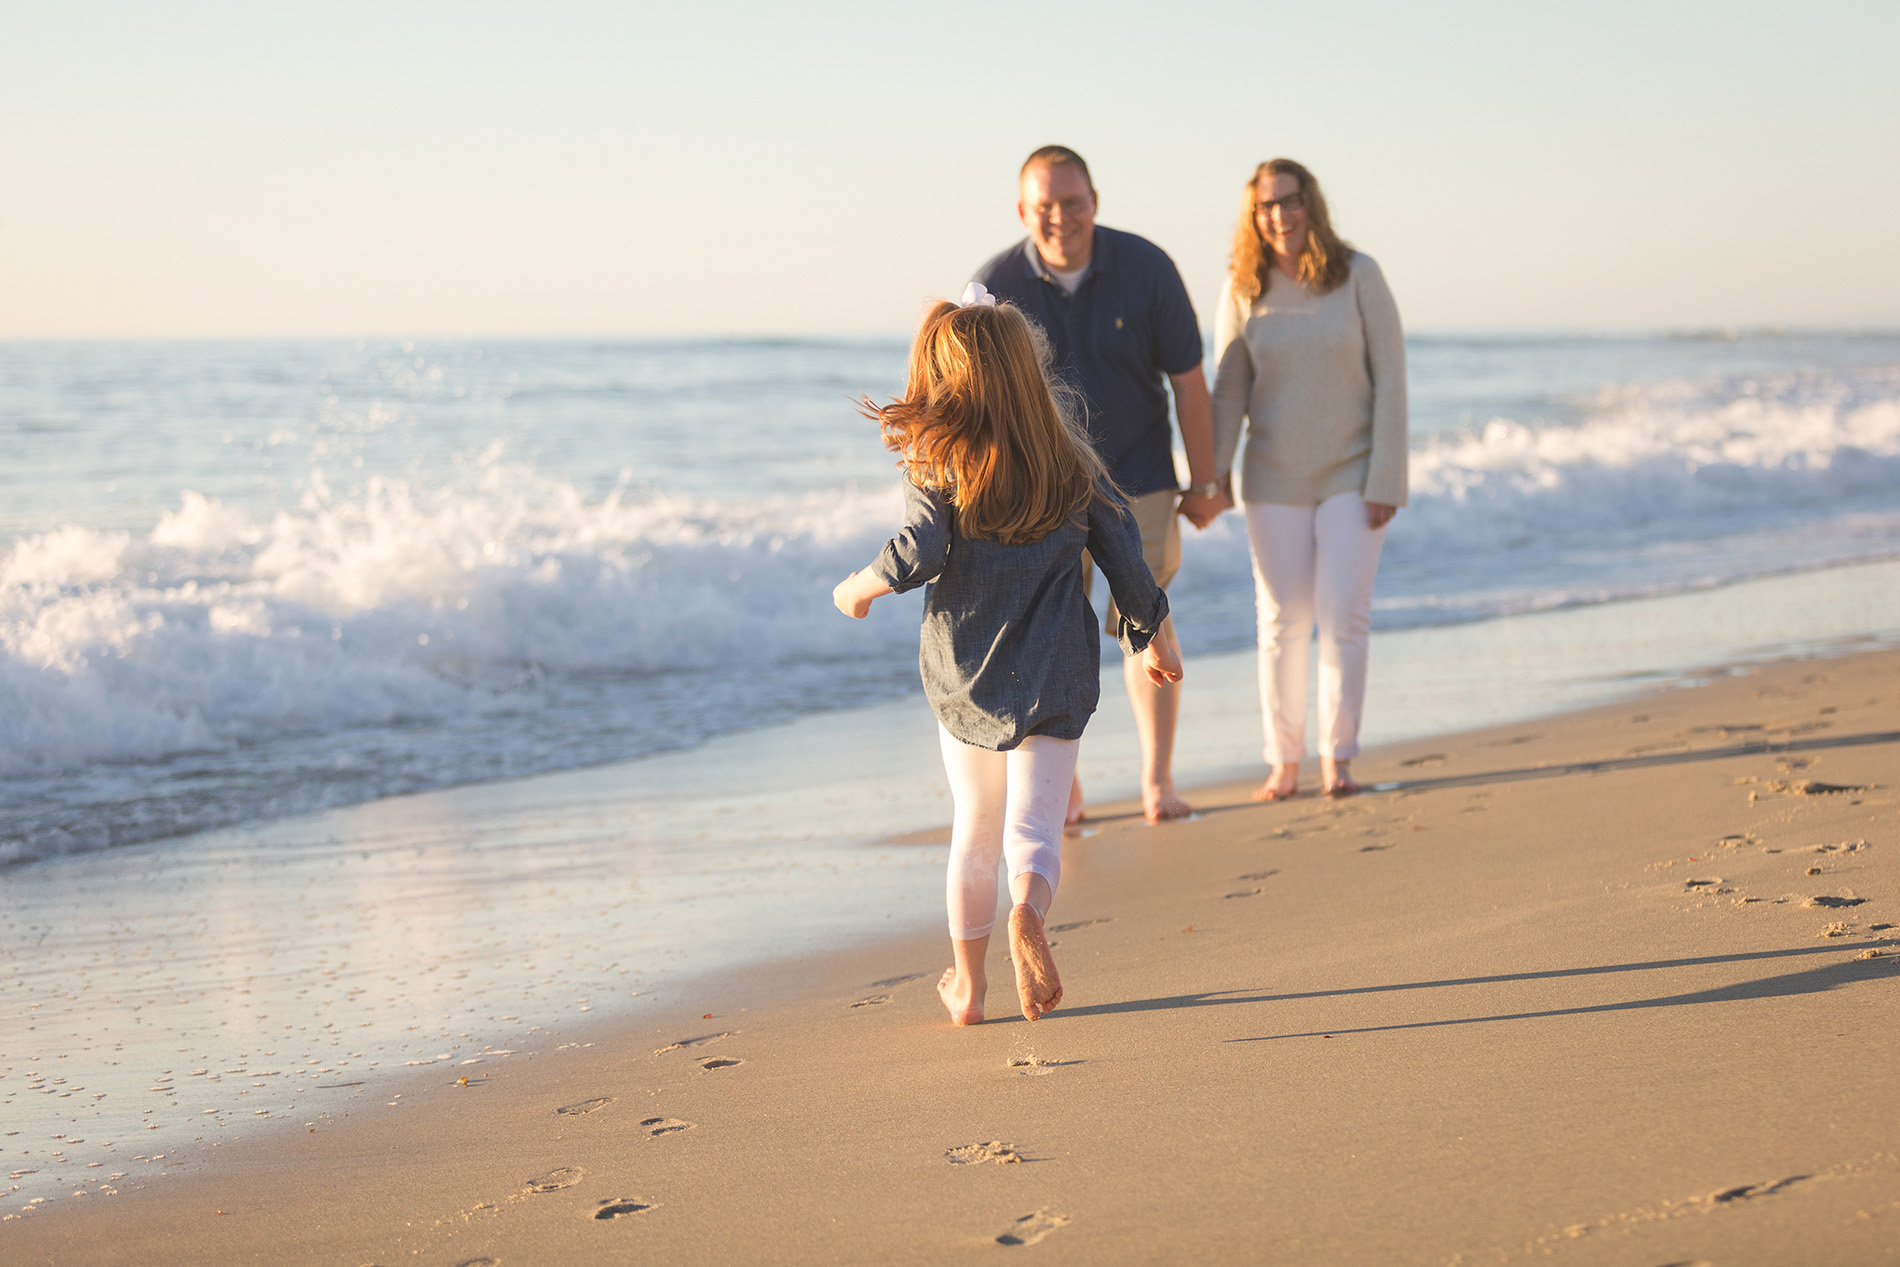 San Diego Family Photographer Christine Dammann Photography  B31